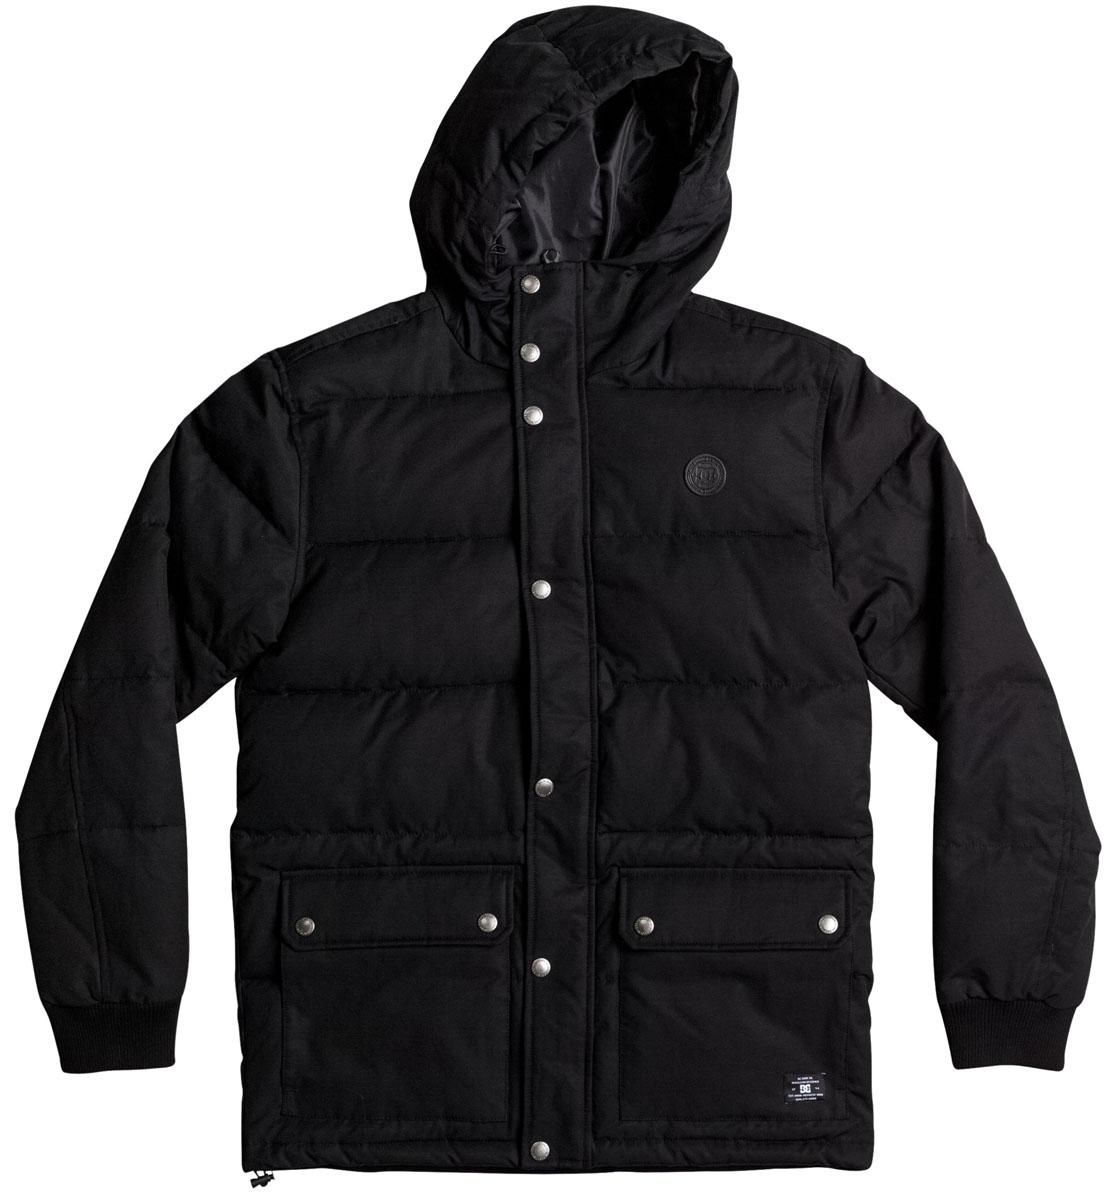 Куртка мужская DC Shoes, цвет: черный. EDYJK03124-KVJ0. Размер M (48)EDYJK03124-KVJ0